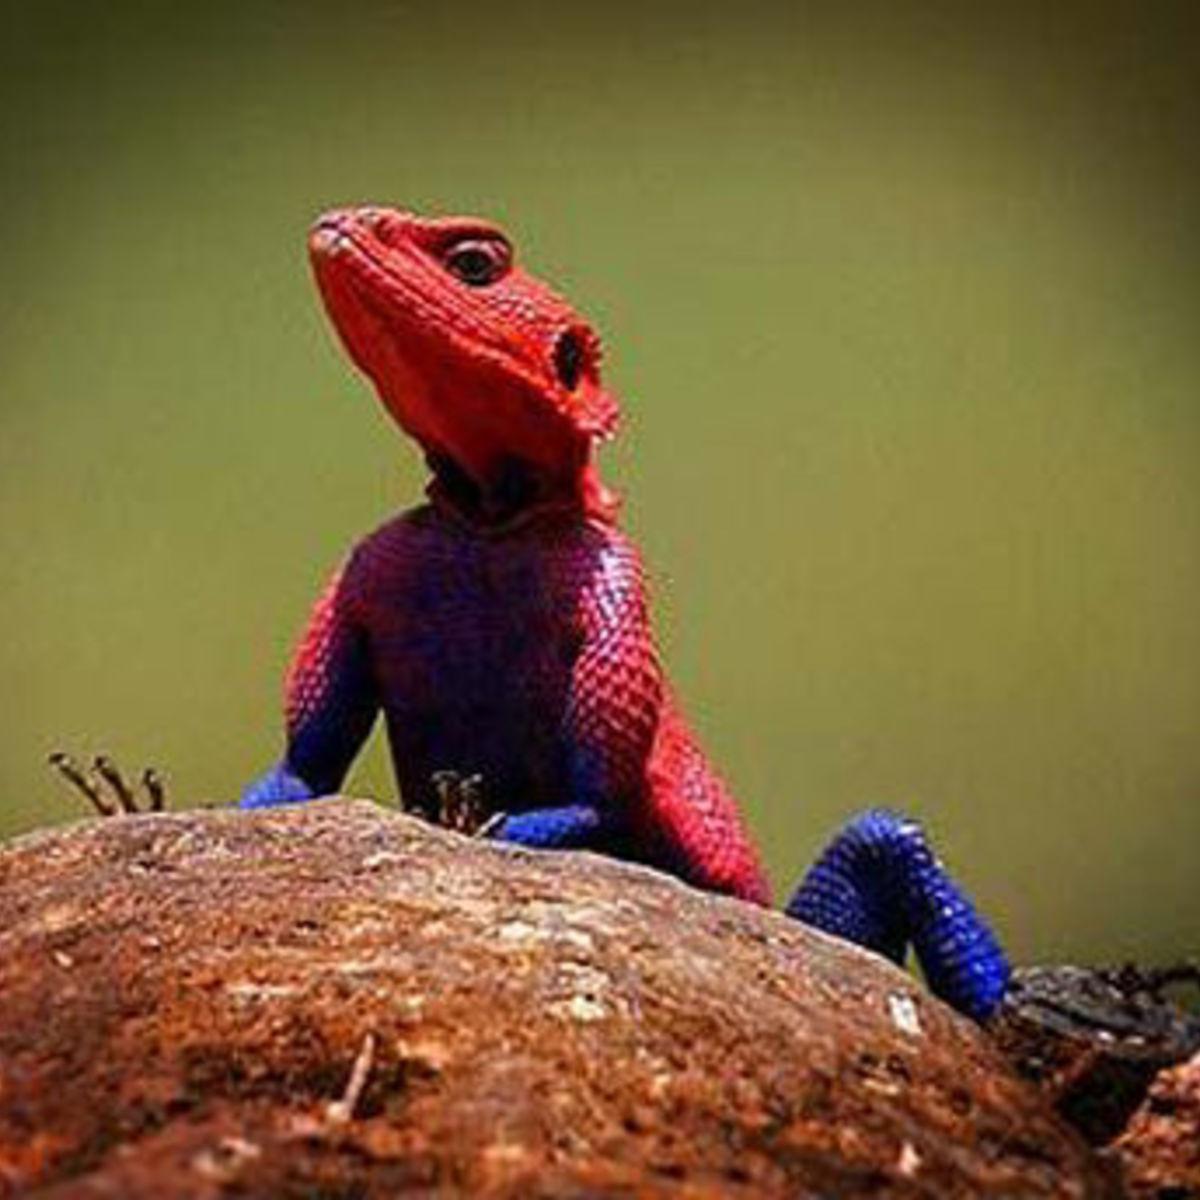 spider_Man_lizard.jpg